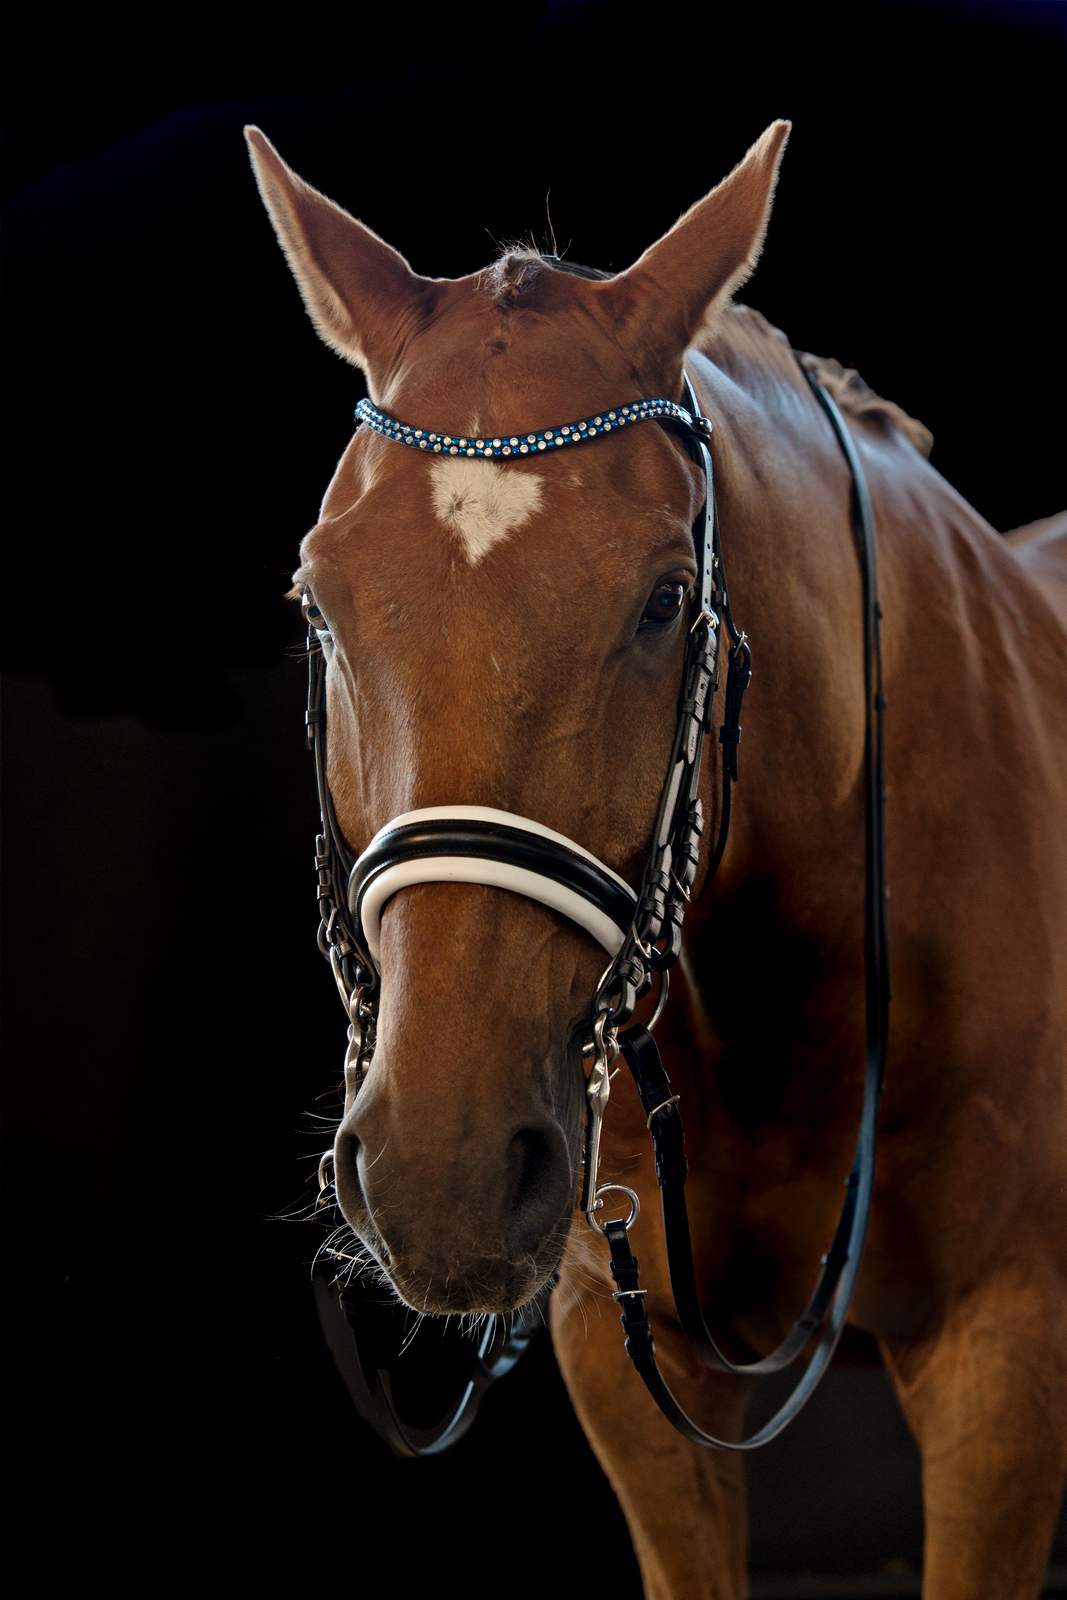 Pferdeshooting-3